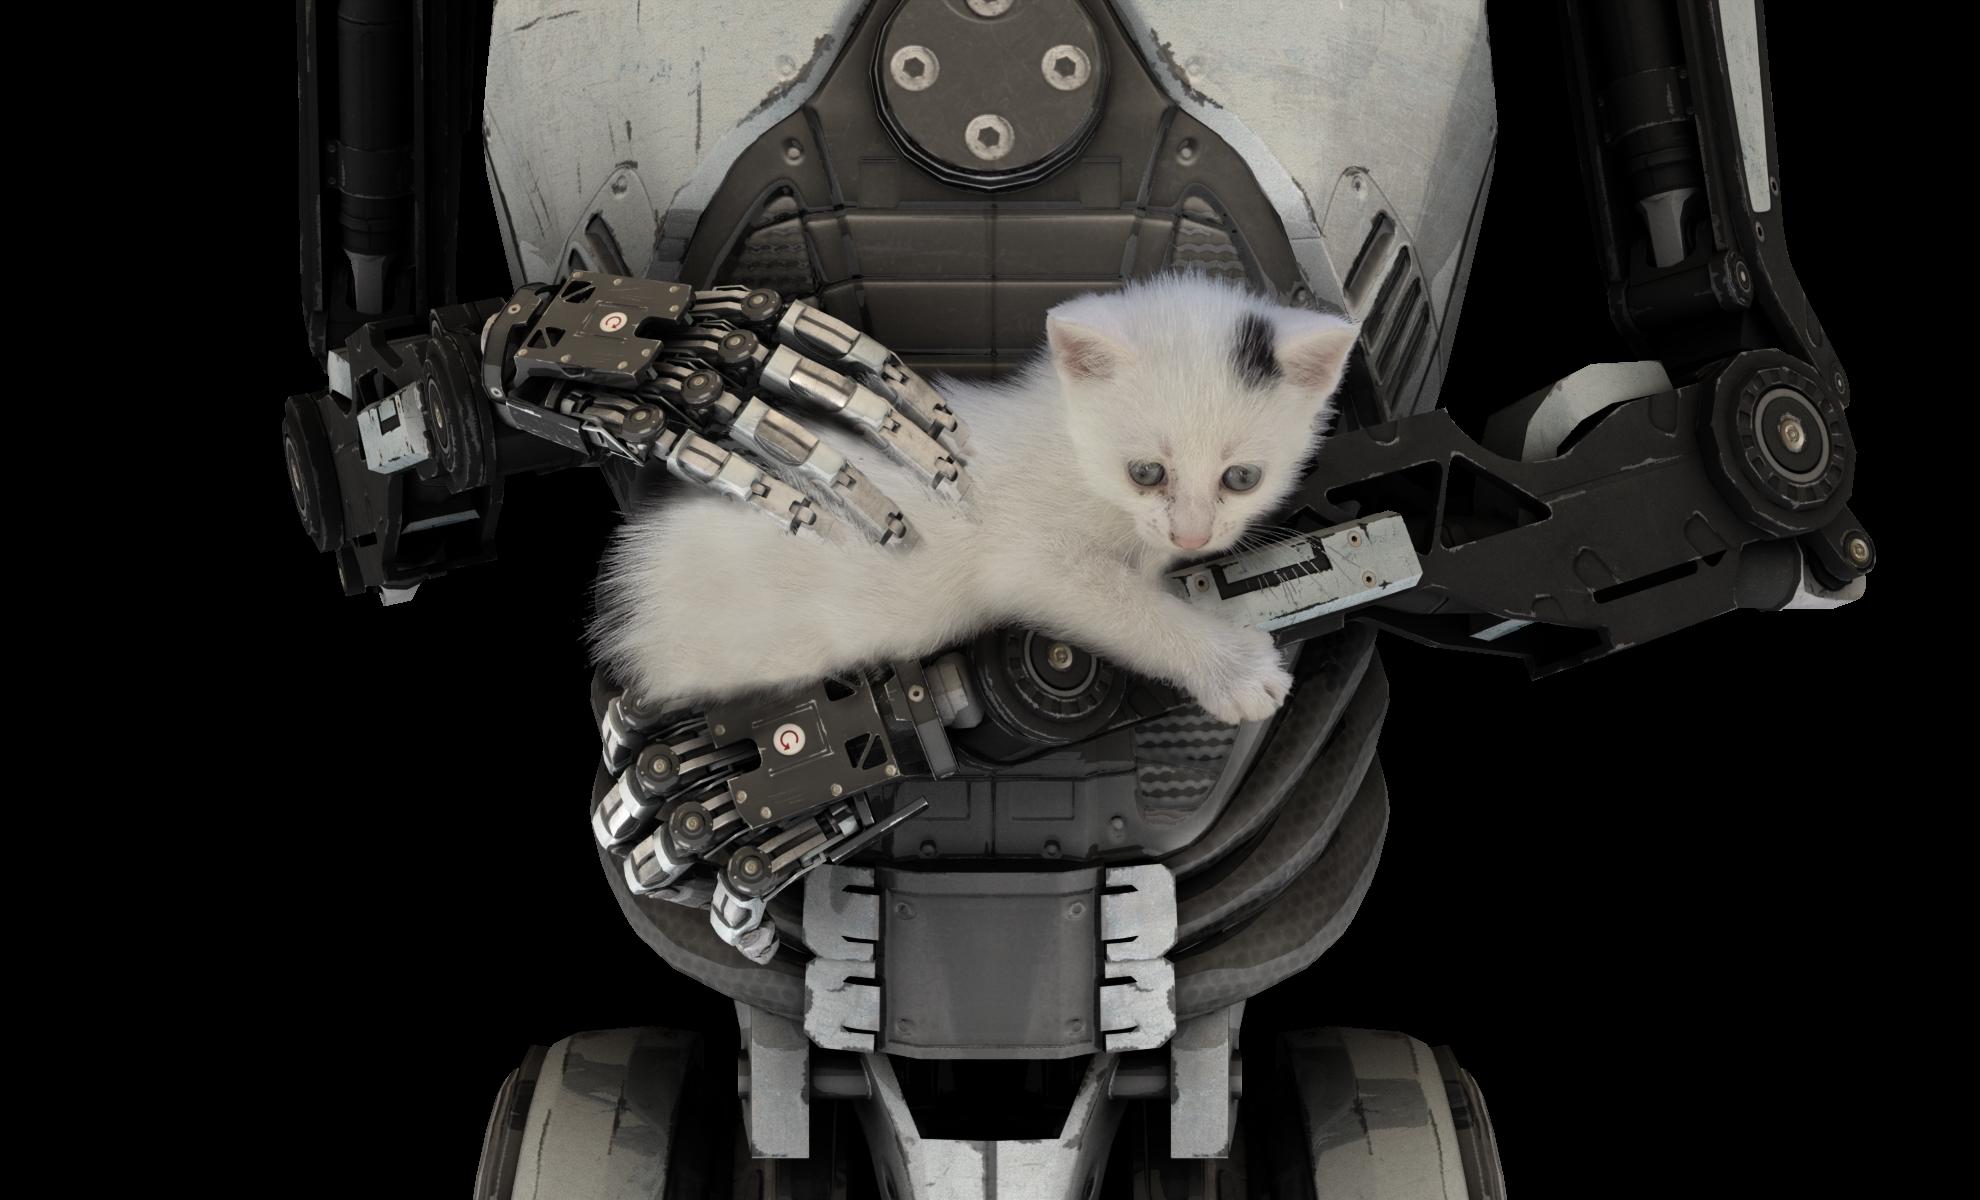 RobotAndCat